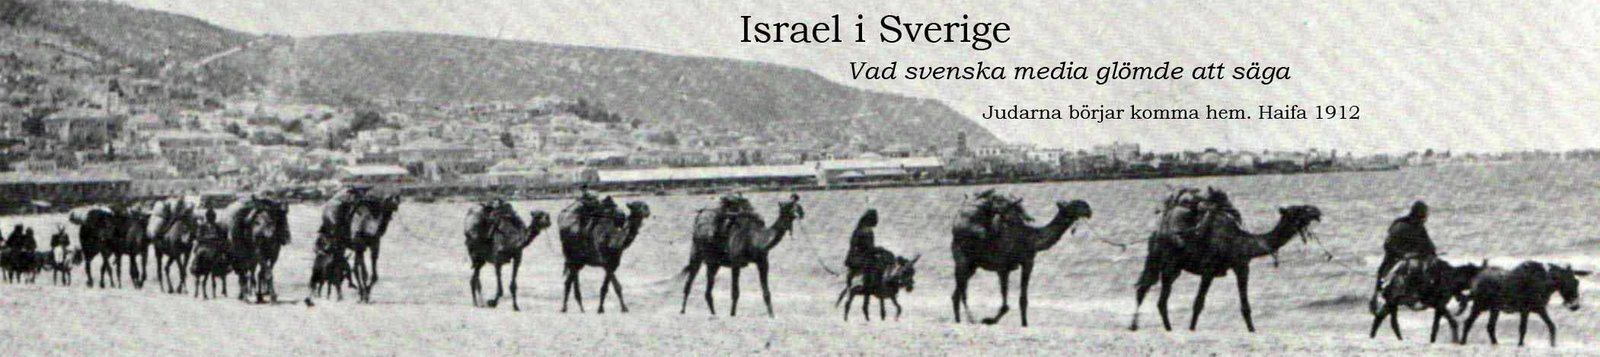 Israel i Sverige[B]